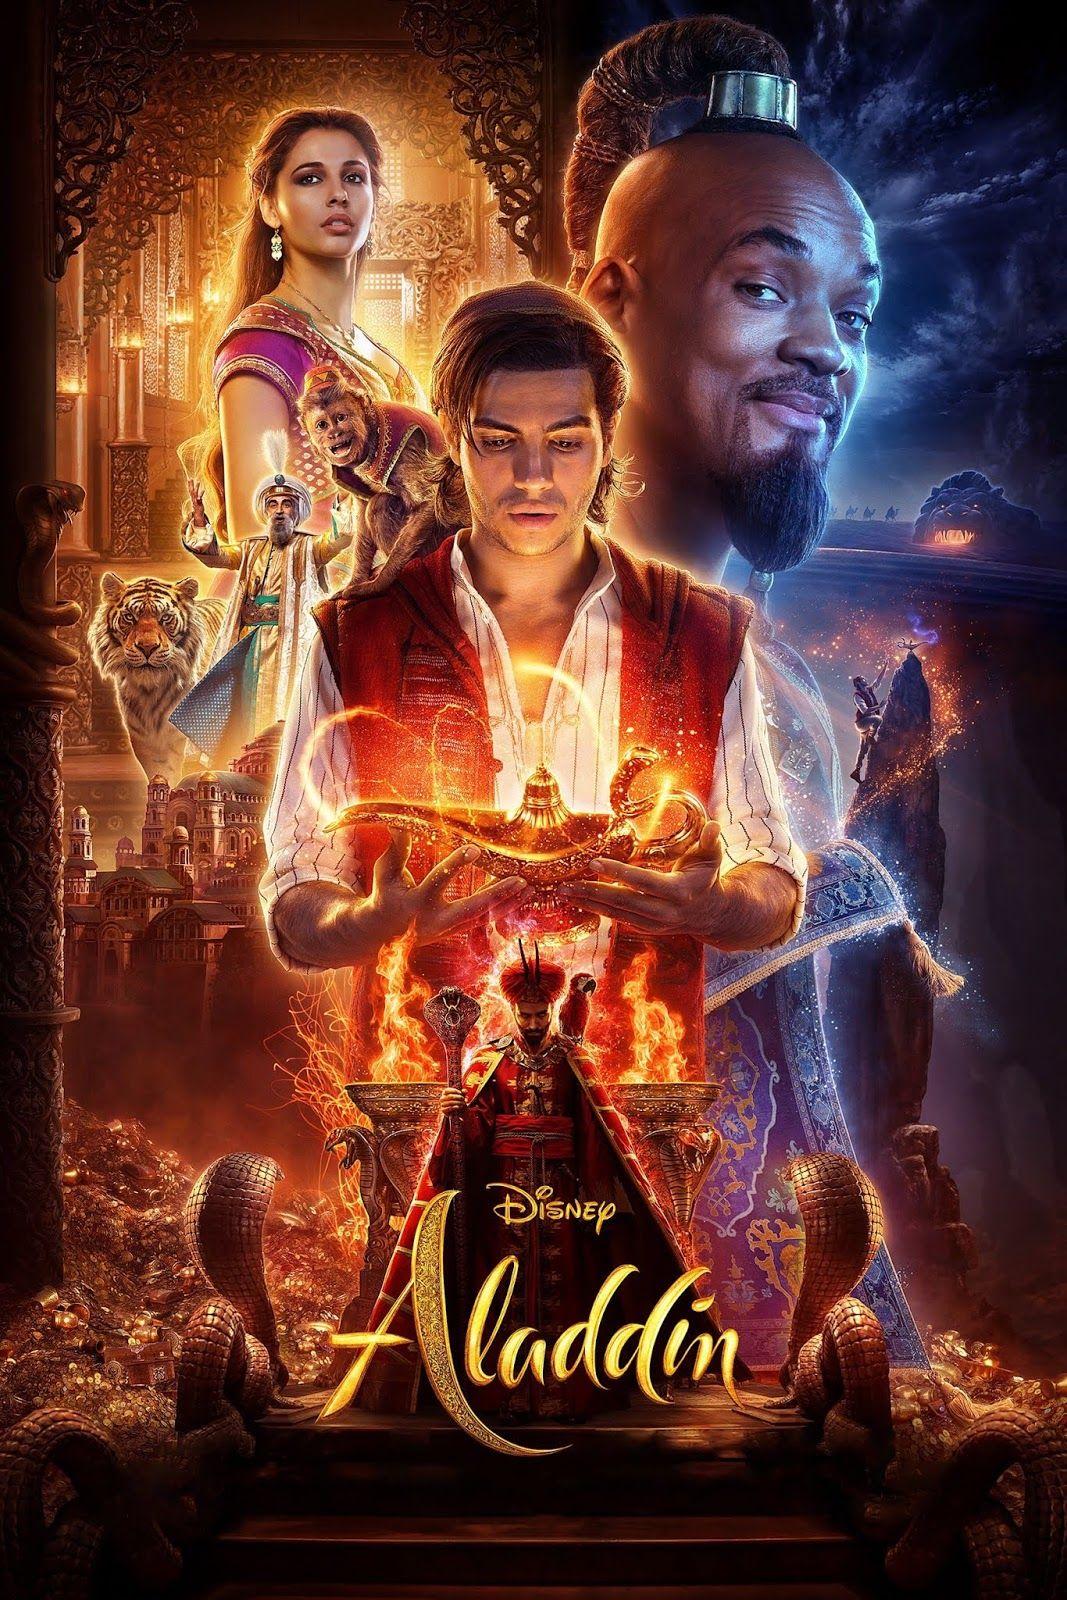 Playtamildub Aladdin 2019 Tamil Dubbed Hd Aladdin Full Movie Aladdin Movie Aladdin Film